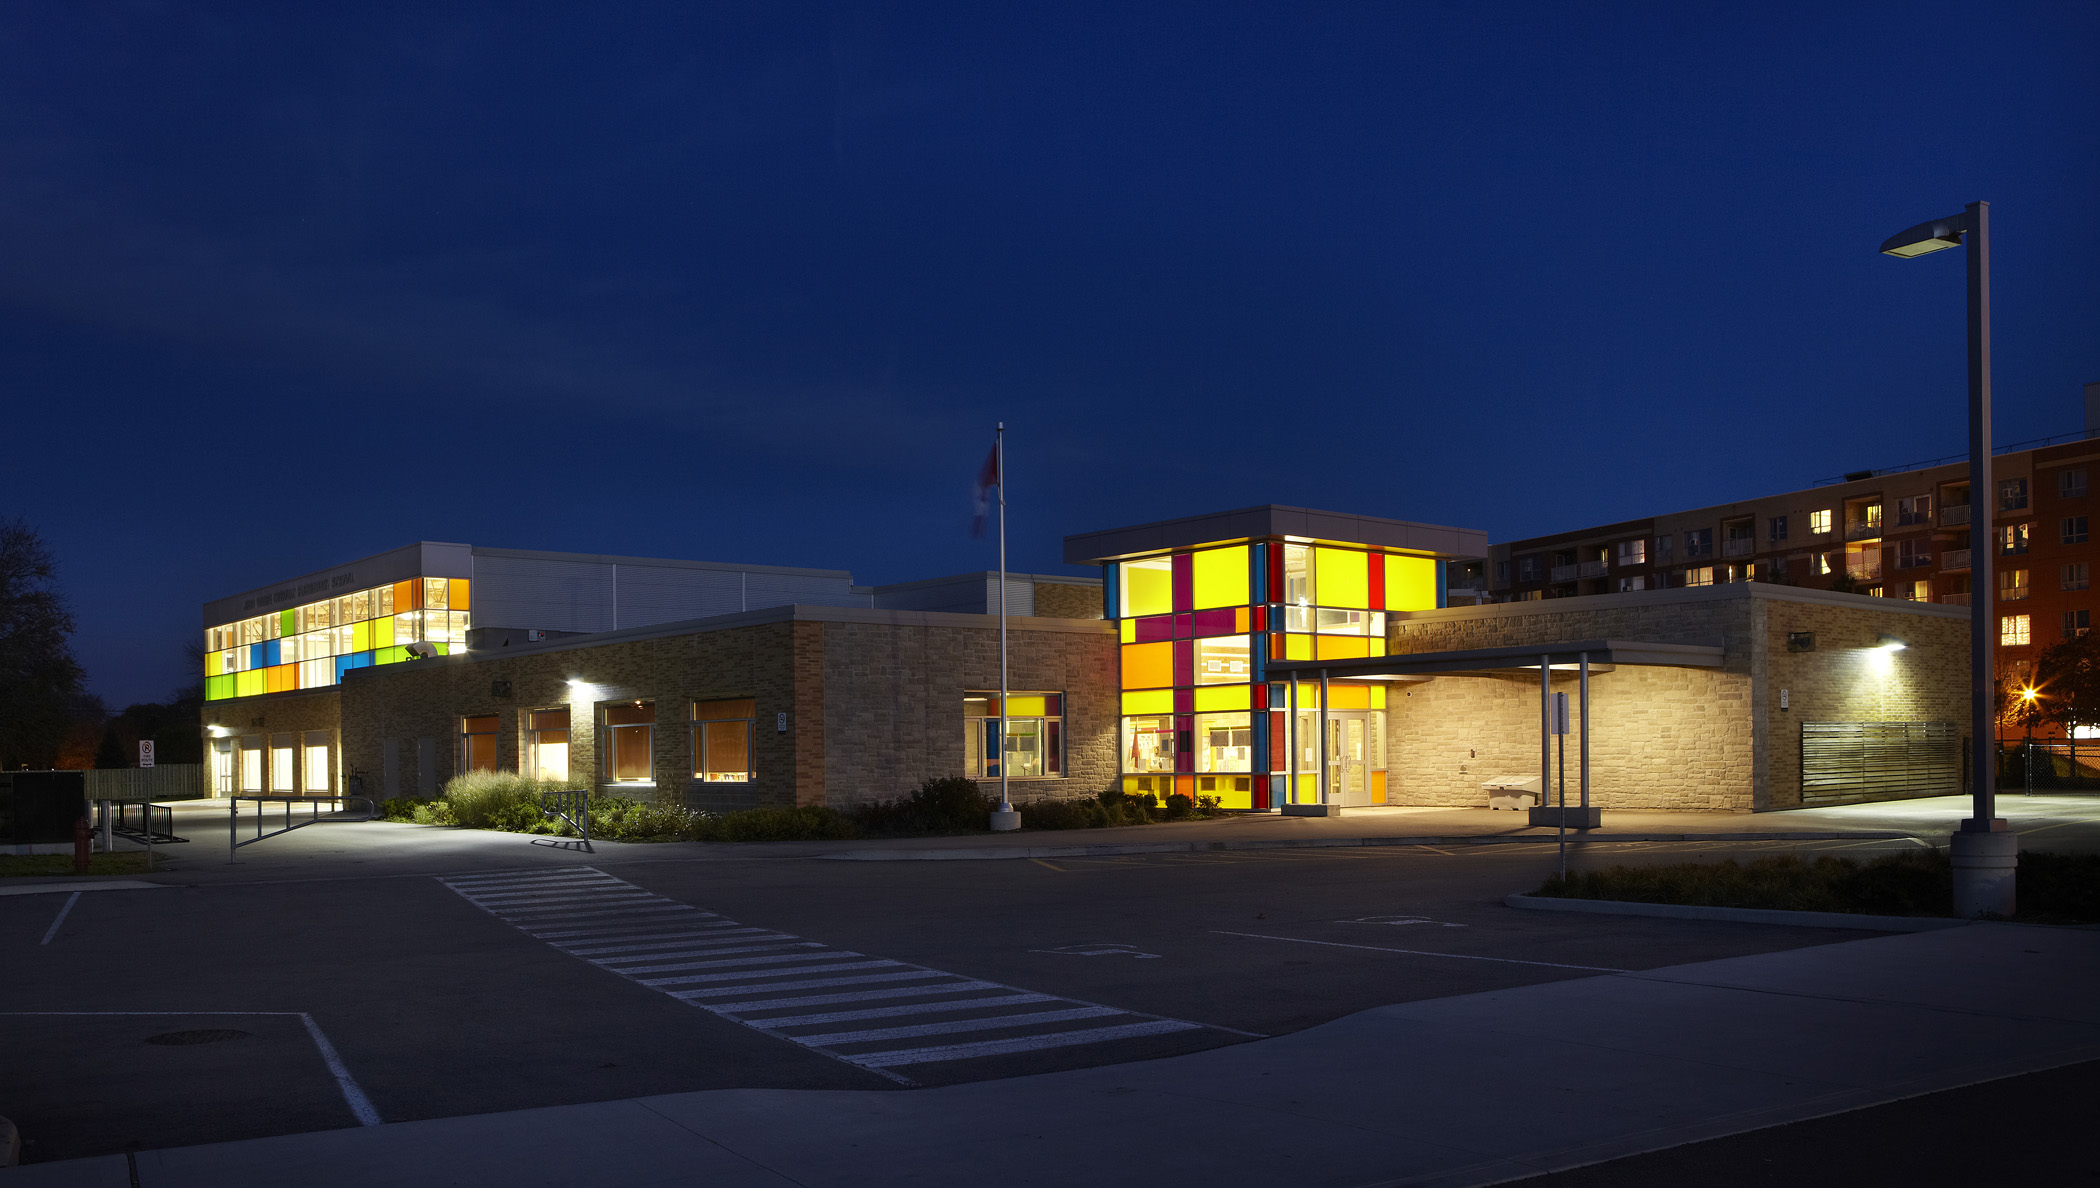 Jean Vanier Catholic Elementary School